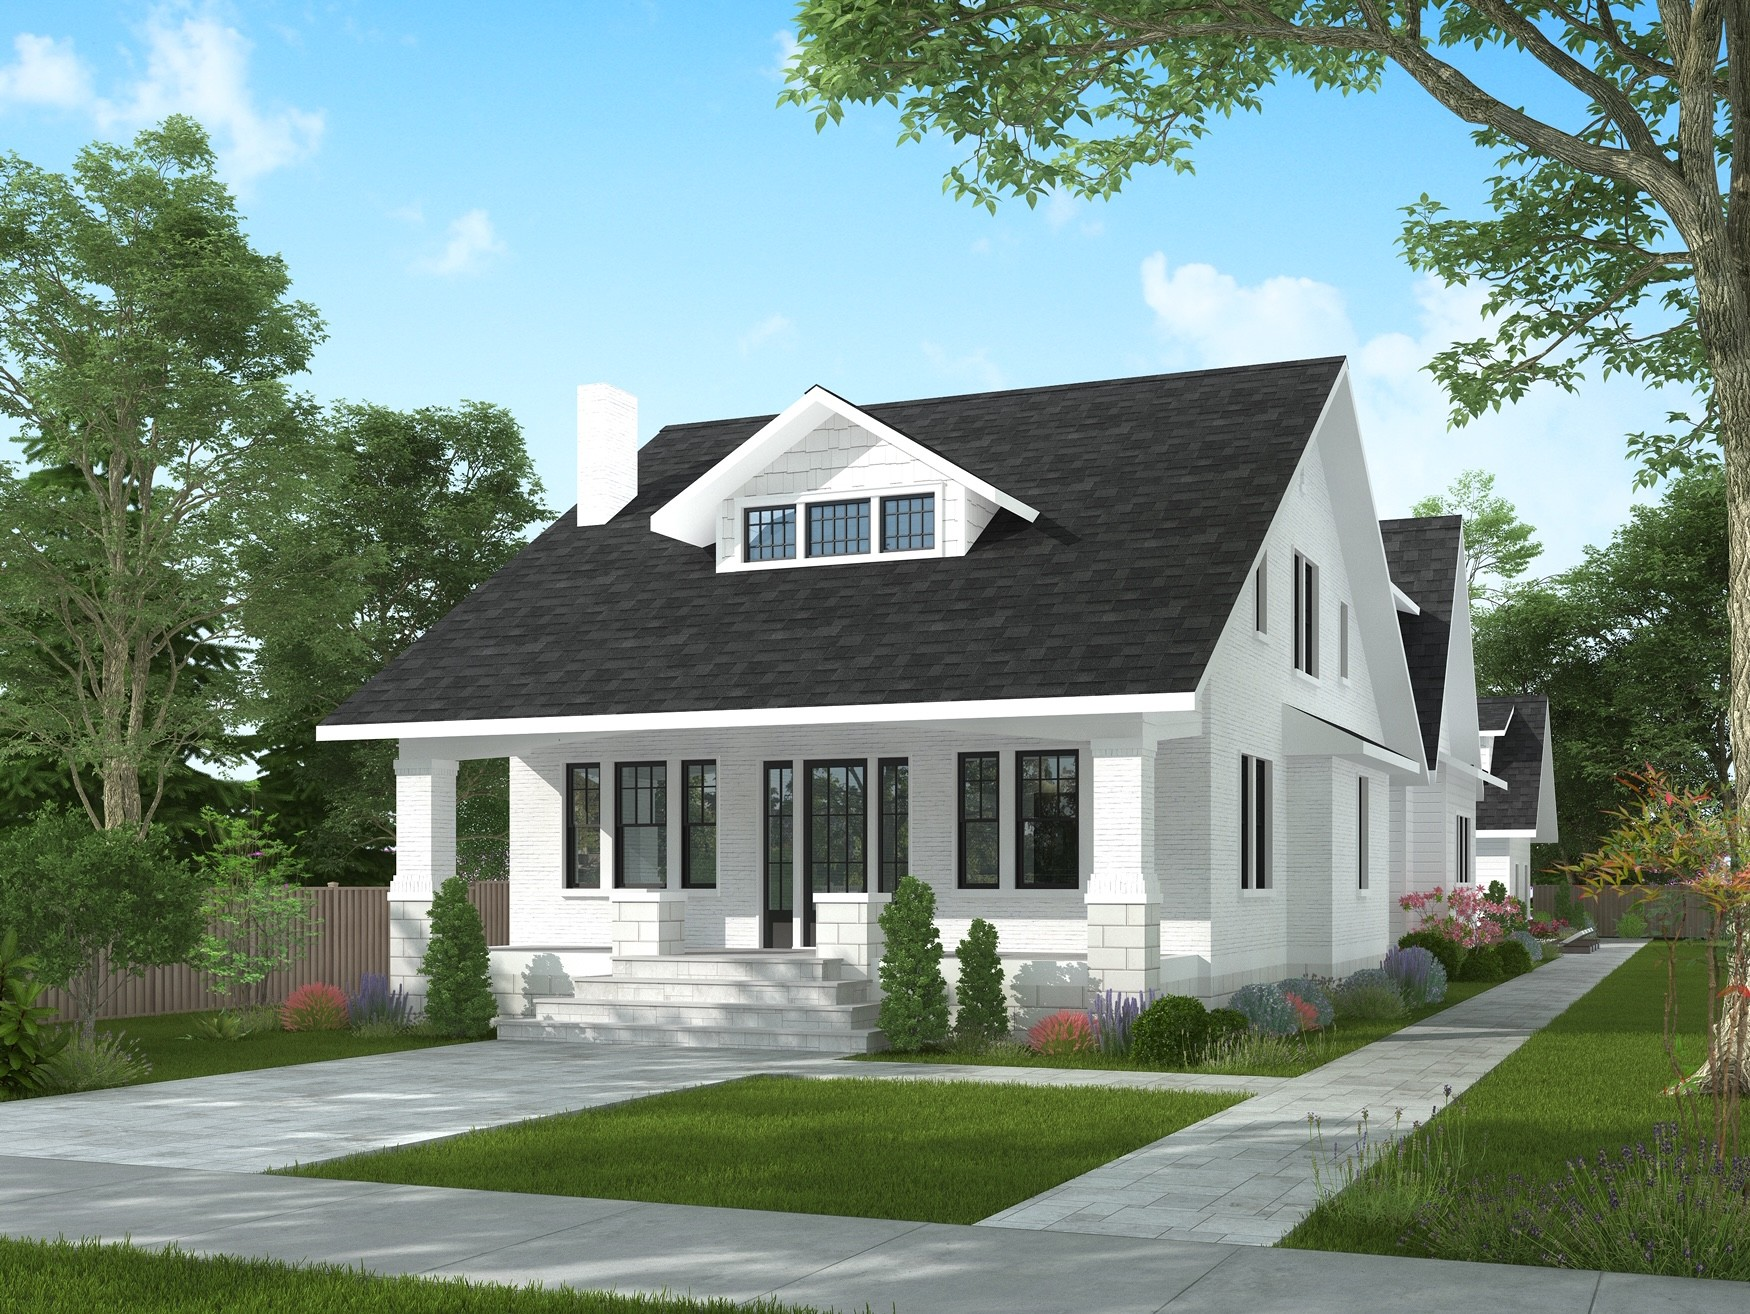 2510 Oakland Ave Property Photo - Nashville, TN real estate listing